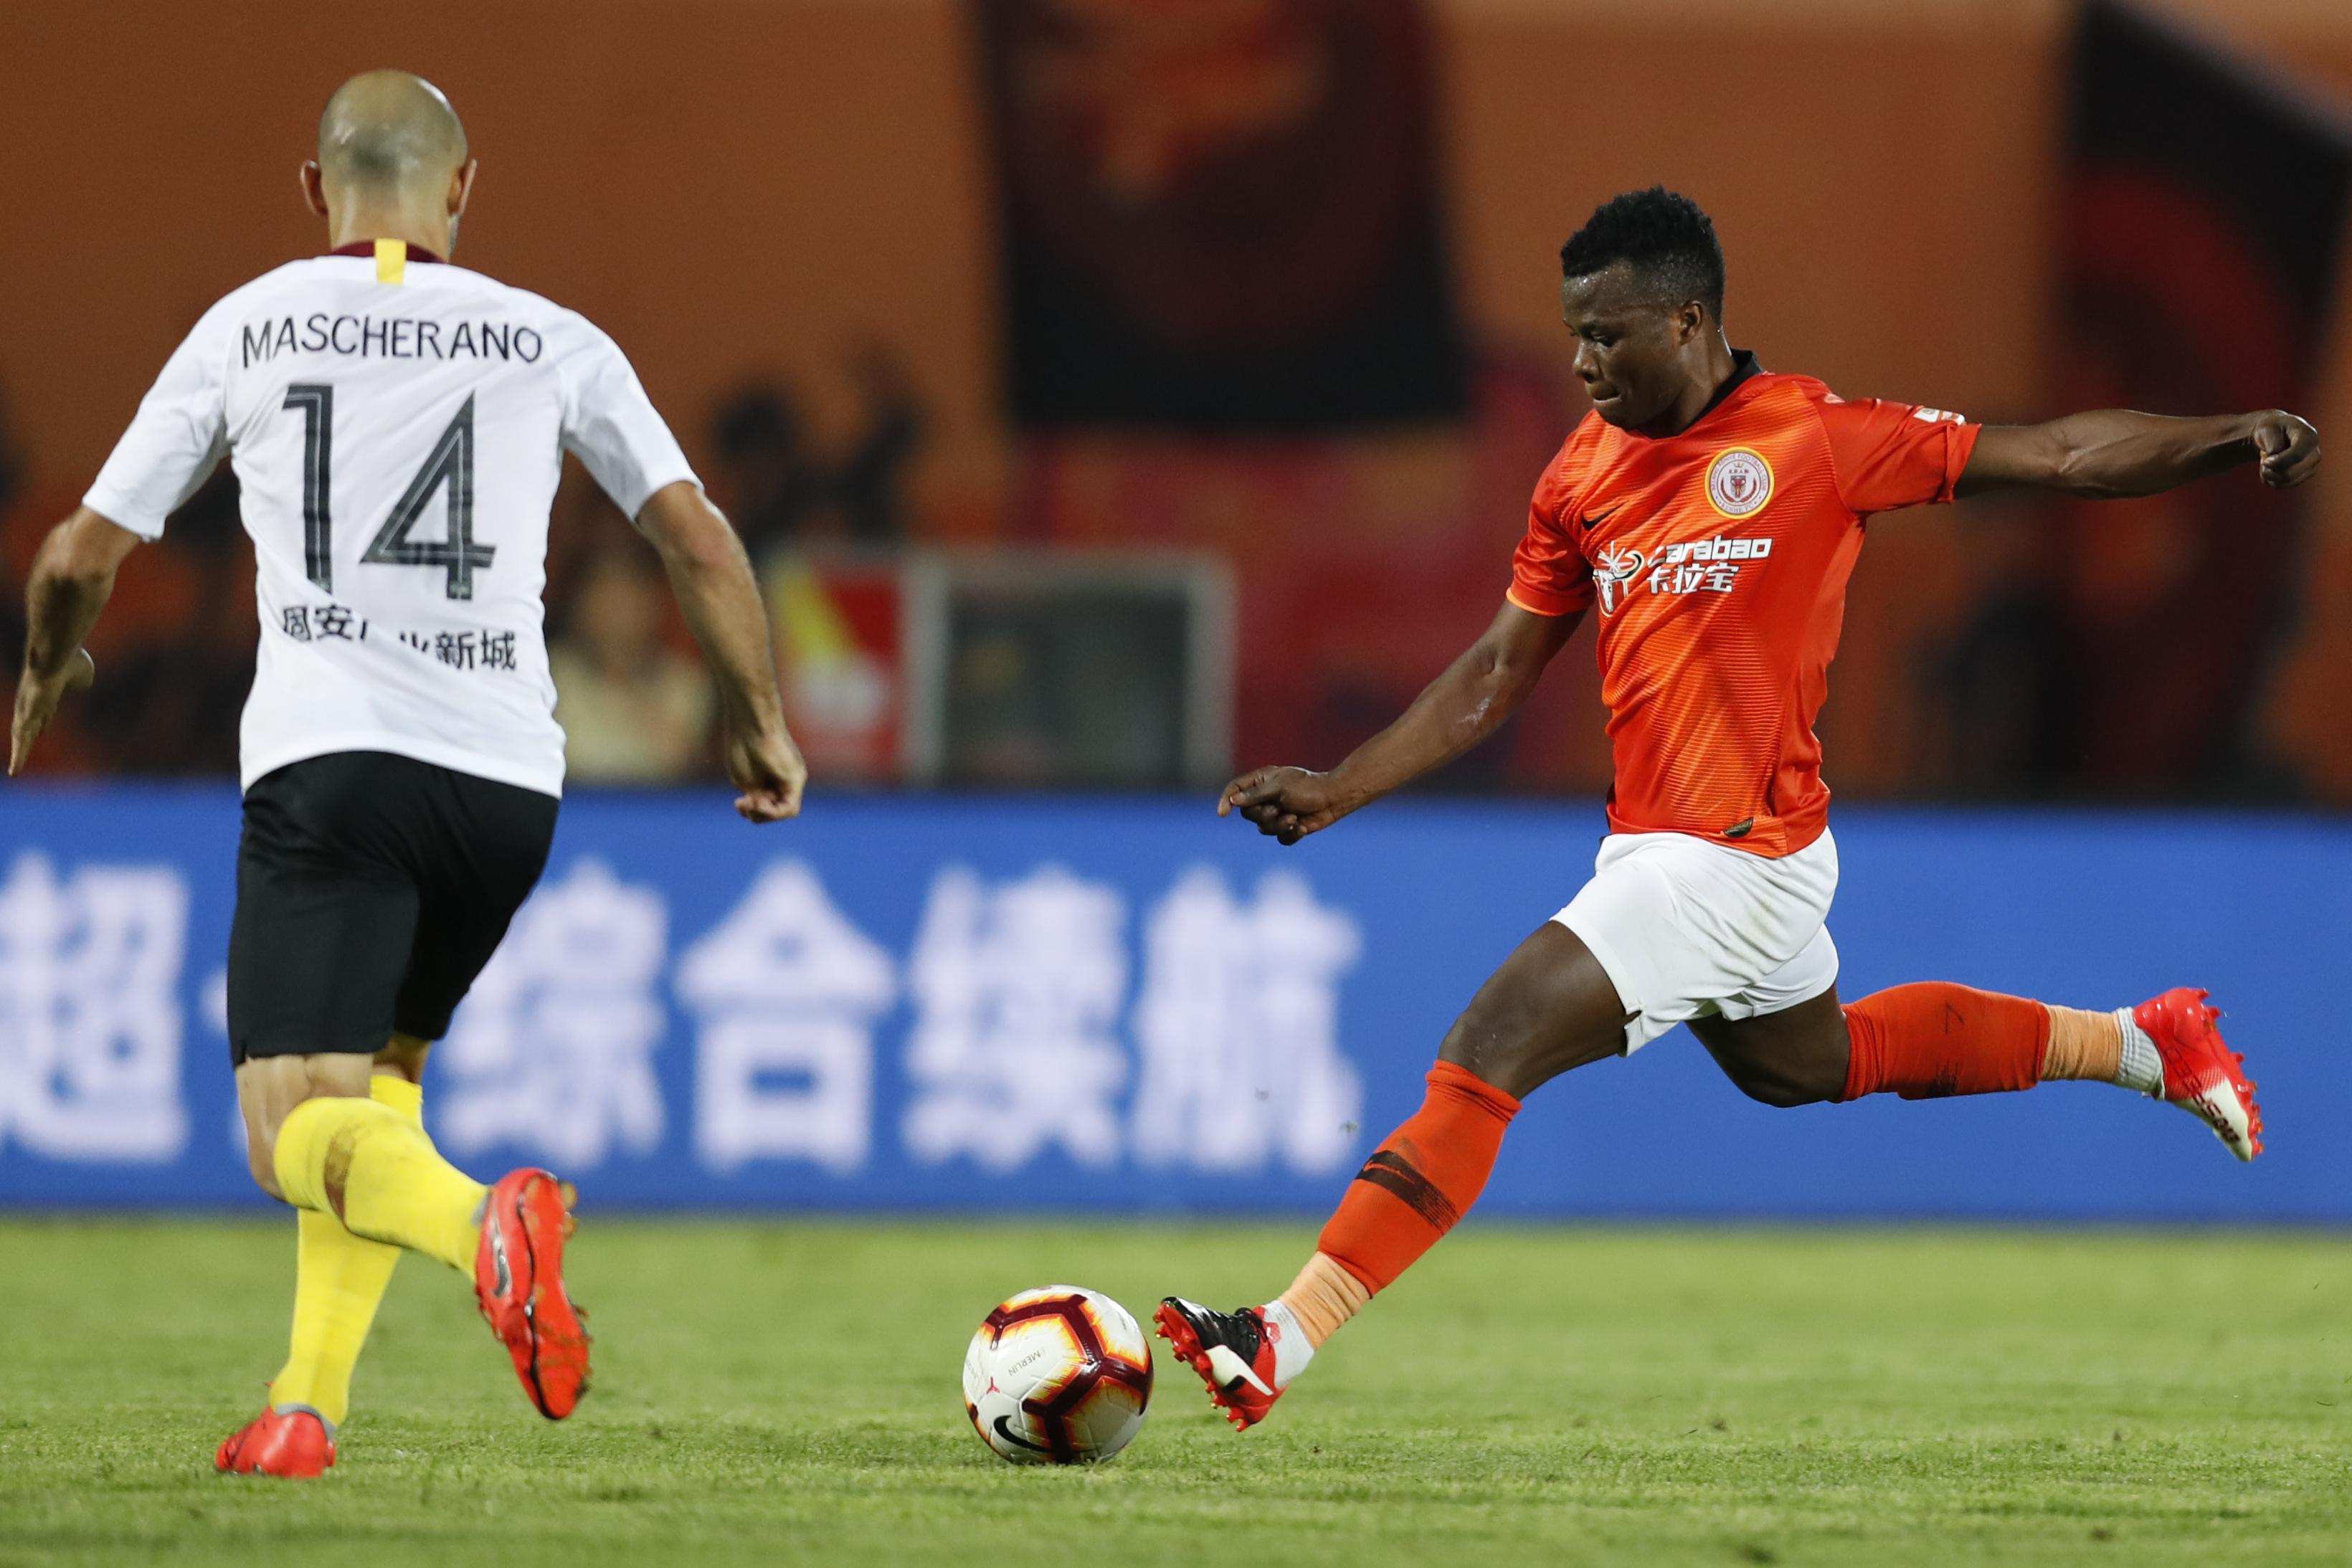 2019 China Super League - Beijing Renhe v Hebei China Fortune